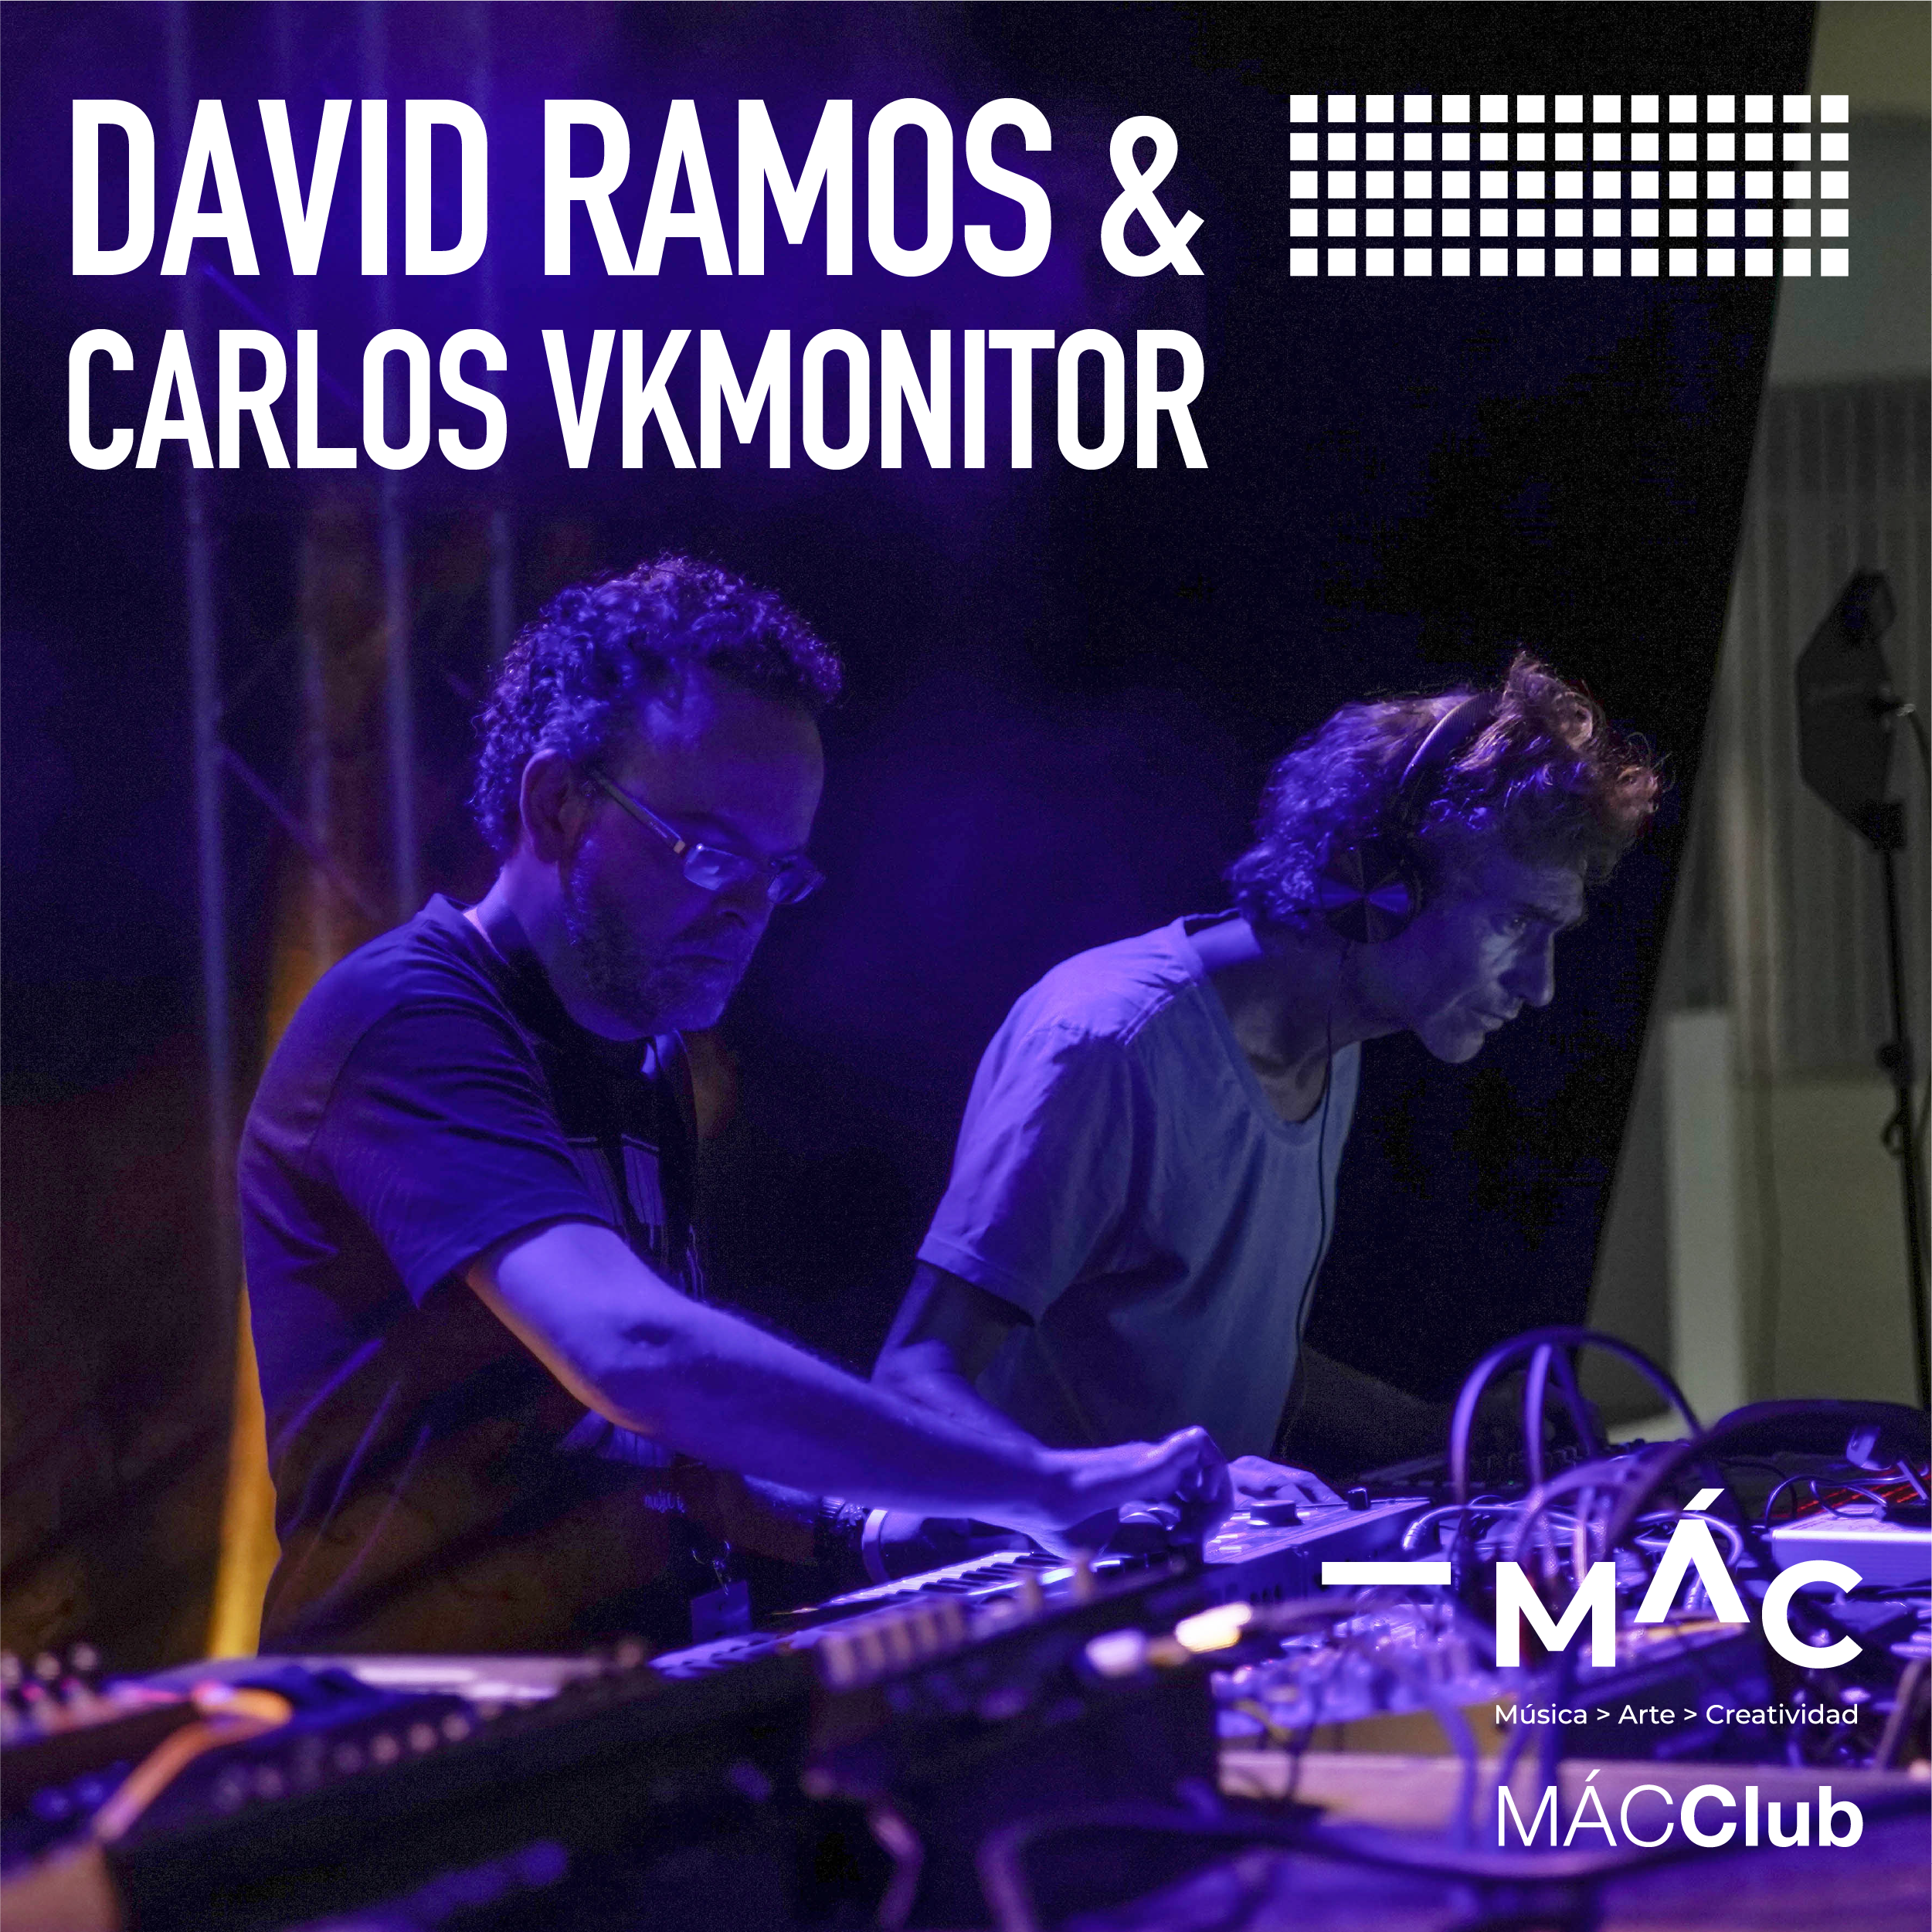 David Ramos & VKmonitor